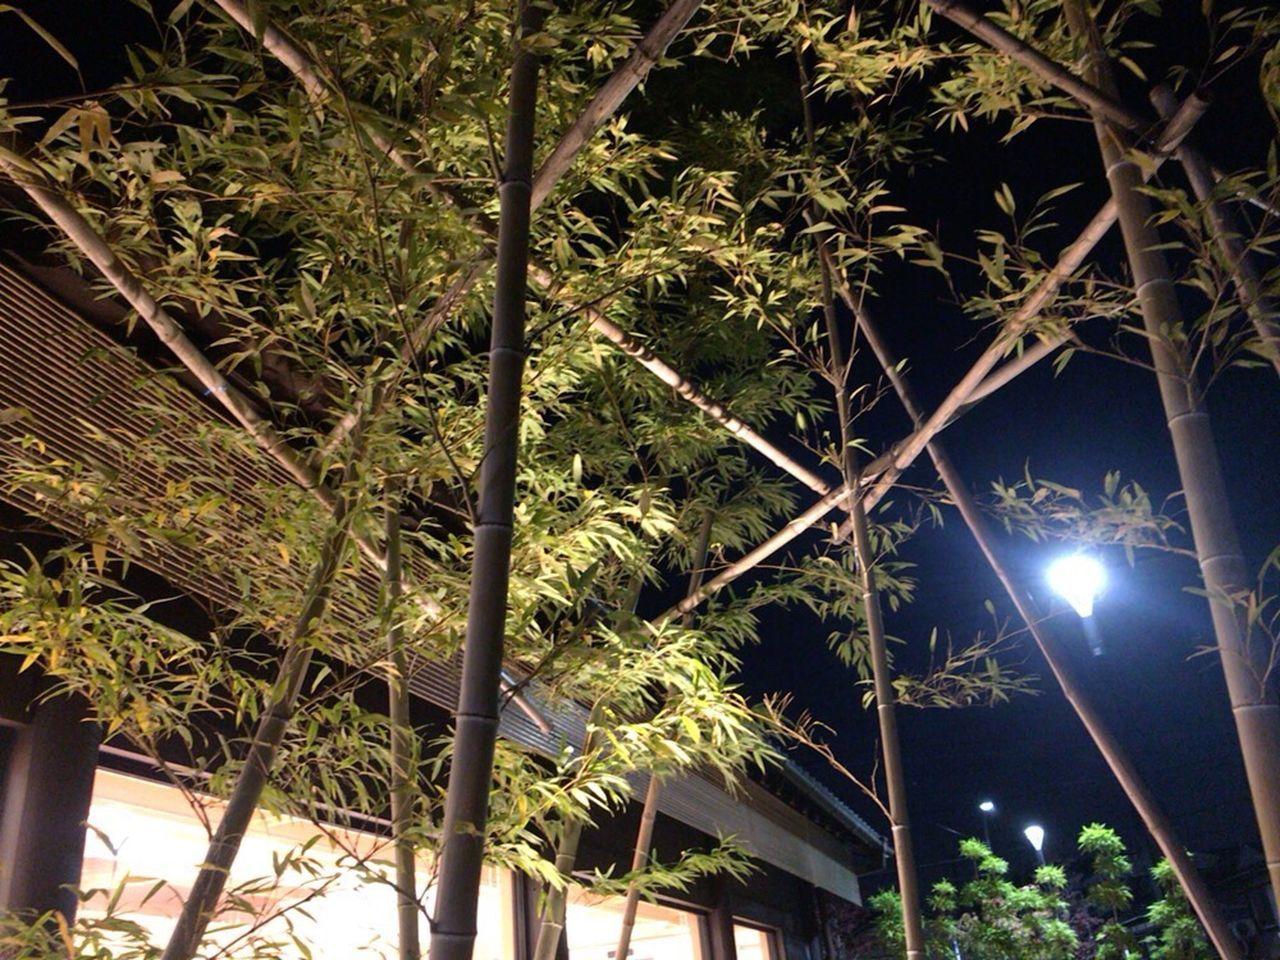 Kyoto,japan Kyoto NIght Lights Kyoto Night Kyoto Bamboo Bamboo Japanese Bamboo Japan Bamboo Bamboo Night Lights